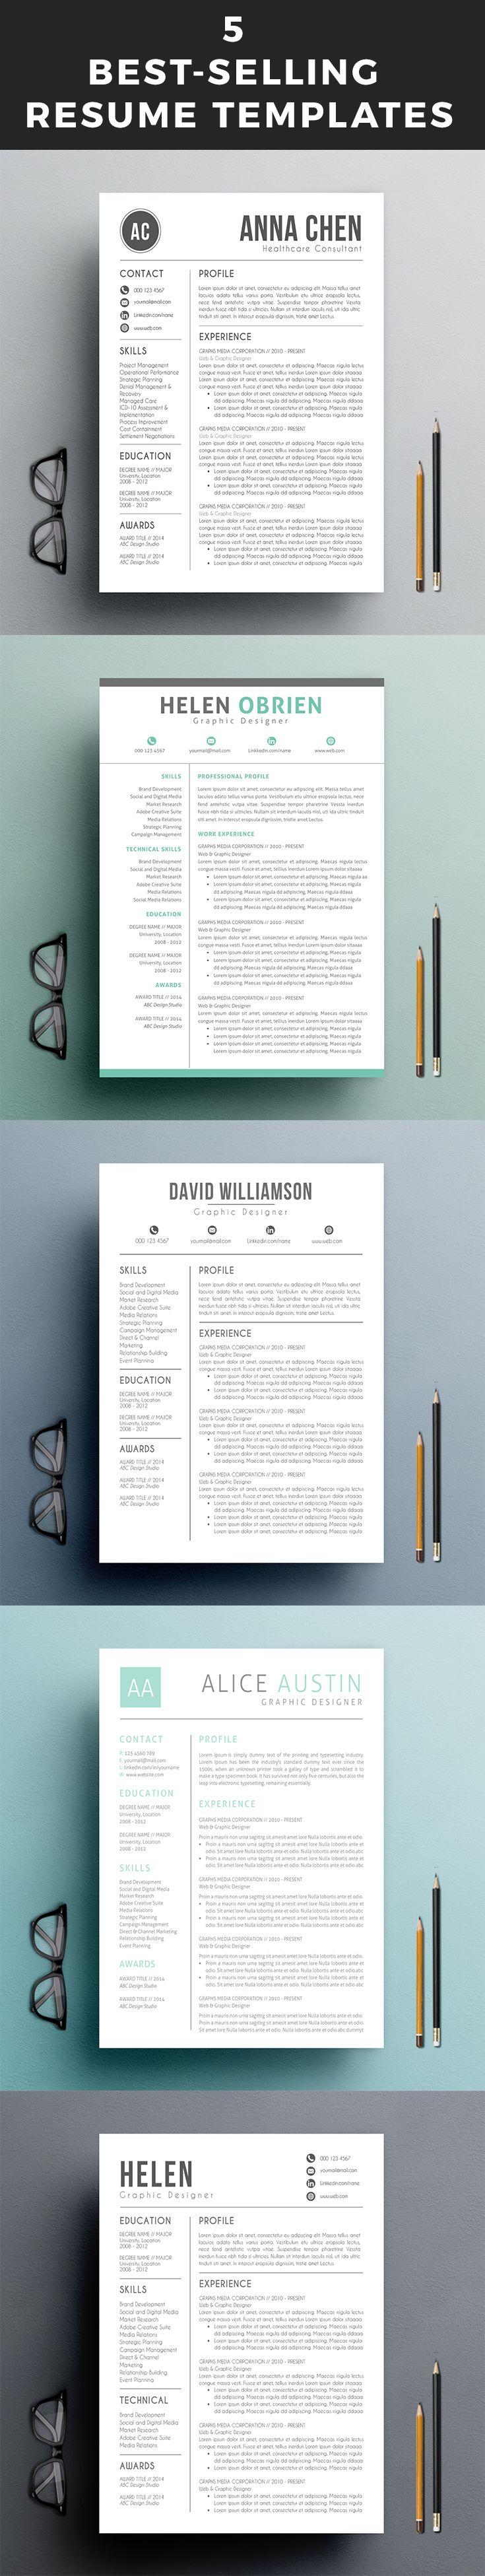 5 Best-Selling Resume Templates | Resume | Pinterest | Currículum